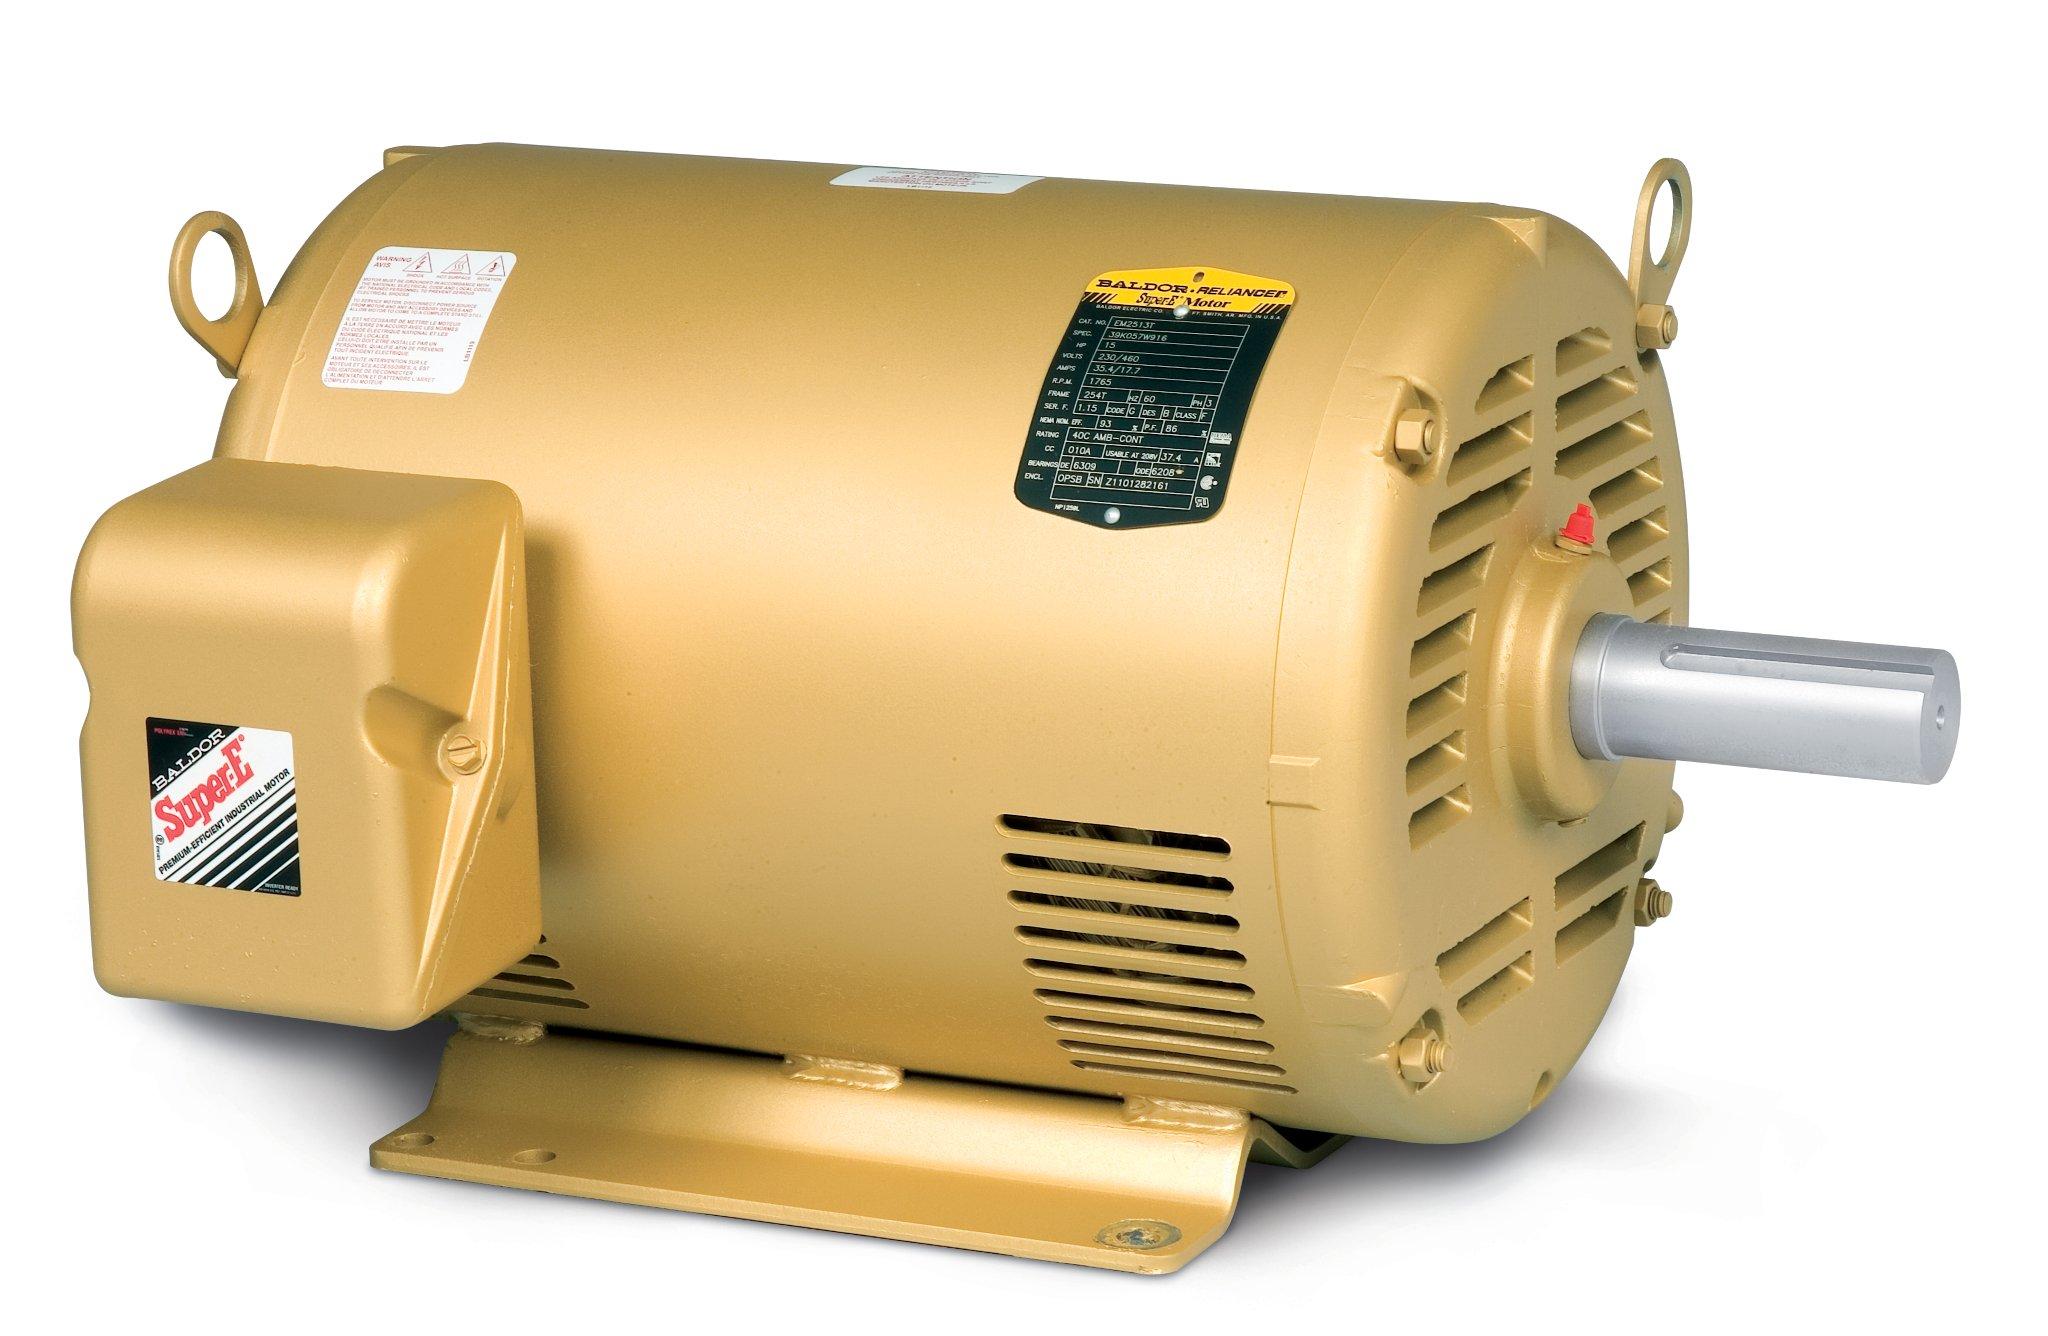 BALDOR EM31115 Small Motor Rule, Three Phase, Open Drip Proof, Foot Mounted, General Purpose Motor, 1 hp, 3450 RPM, 3PH, 60 Hz, 56, 3420M, ODP, F1, N, 208-230/460V, Steel